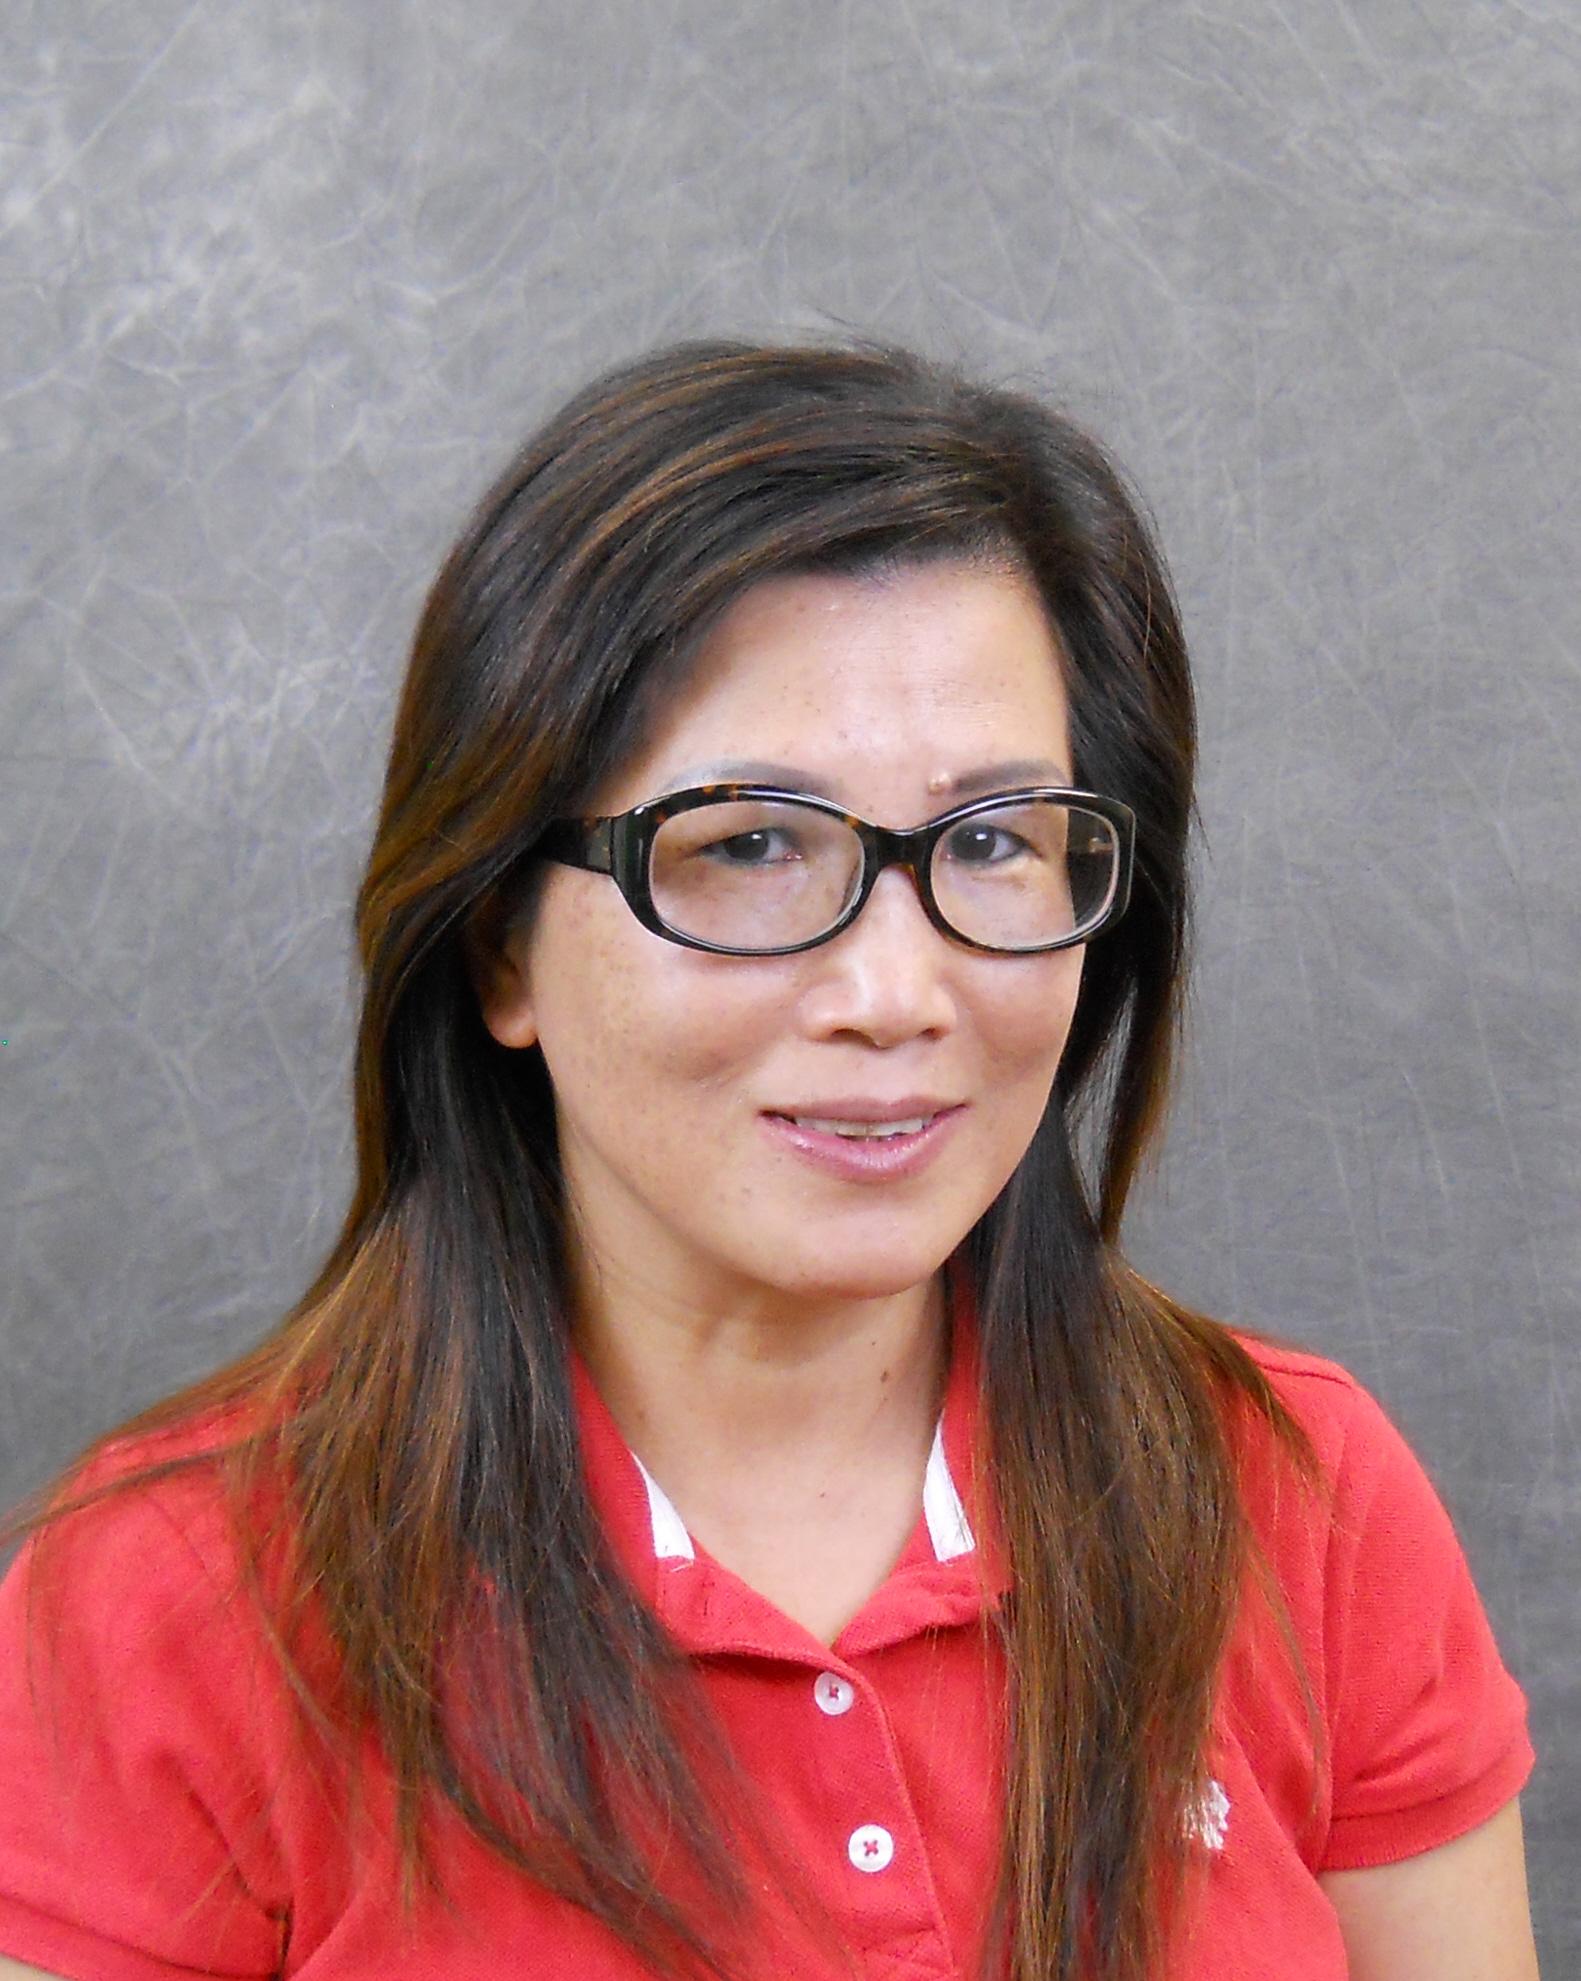 photo of CAO AMY